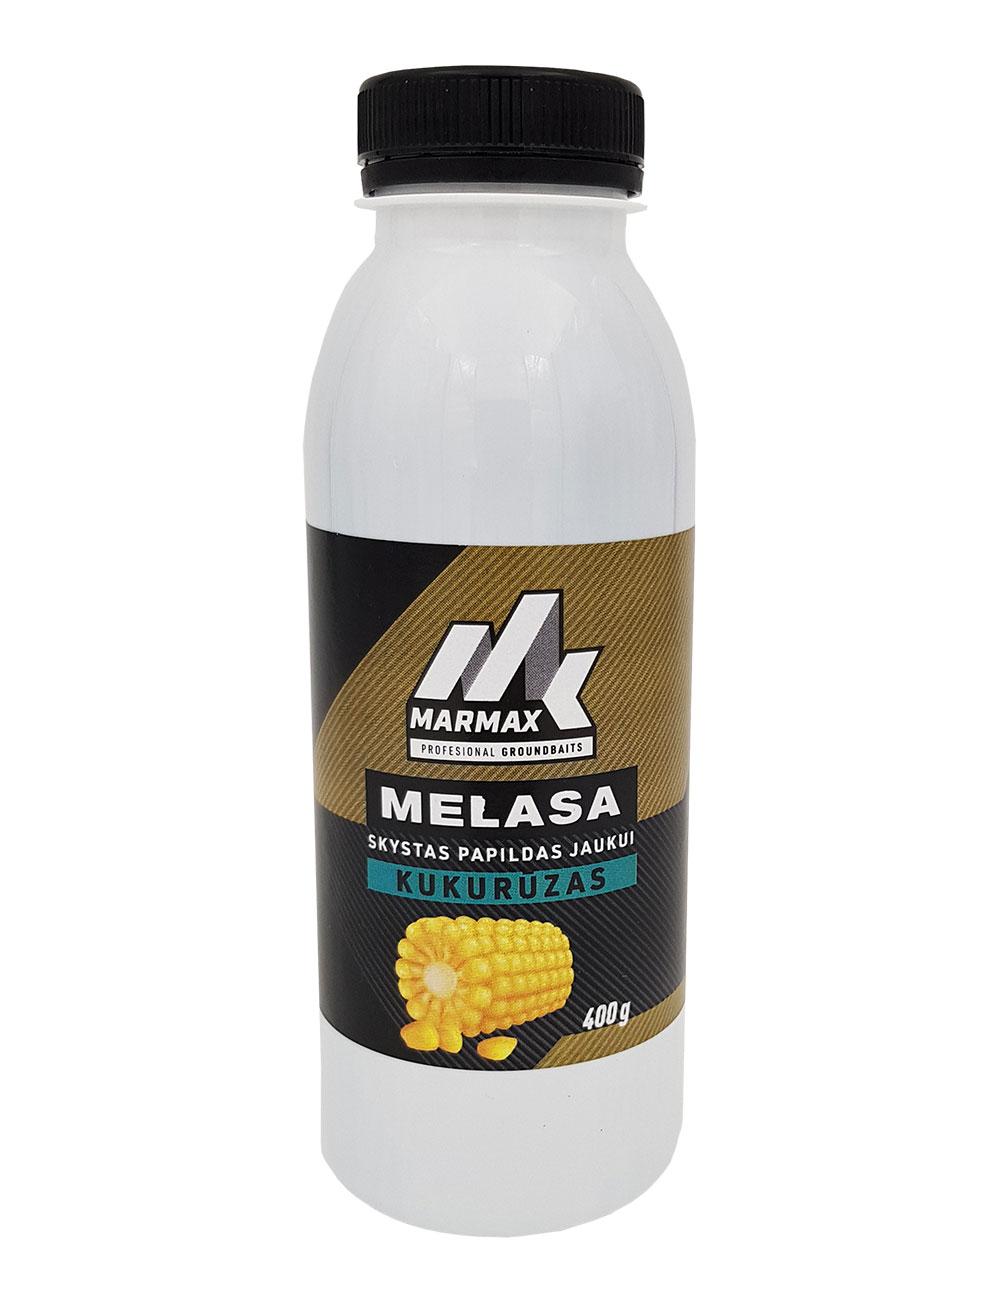 Melasa - Kukurūzas (400g)